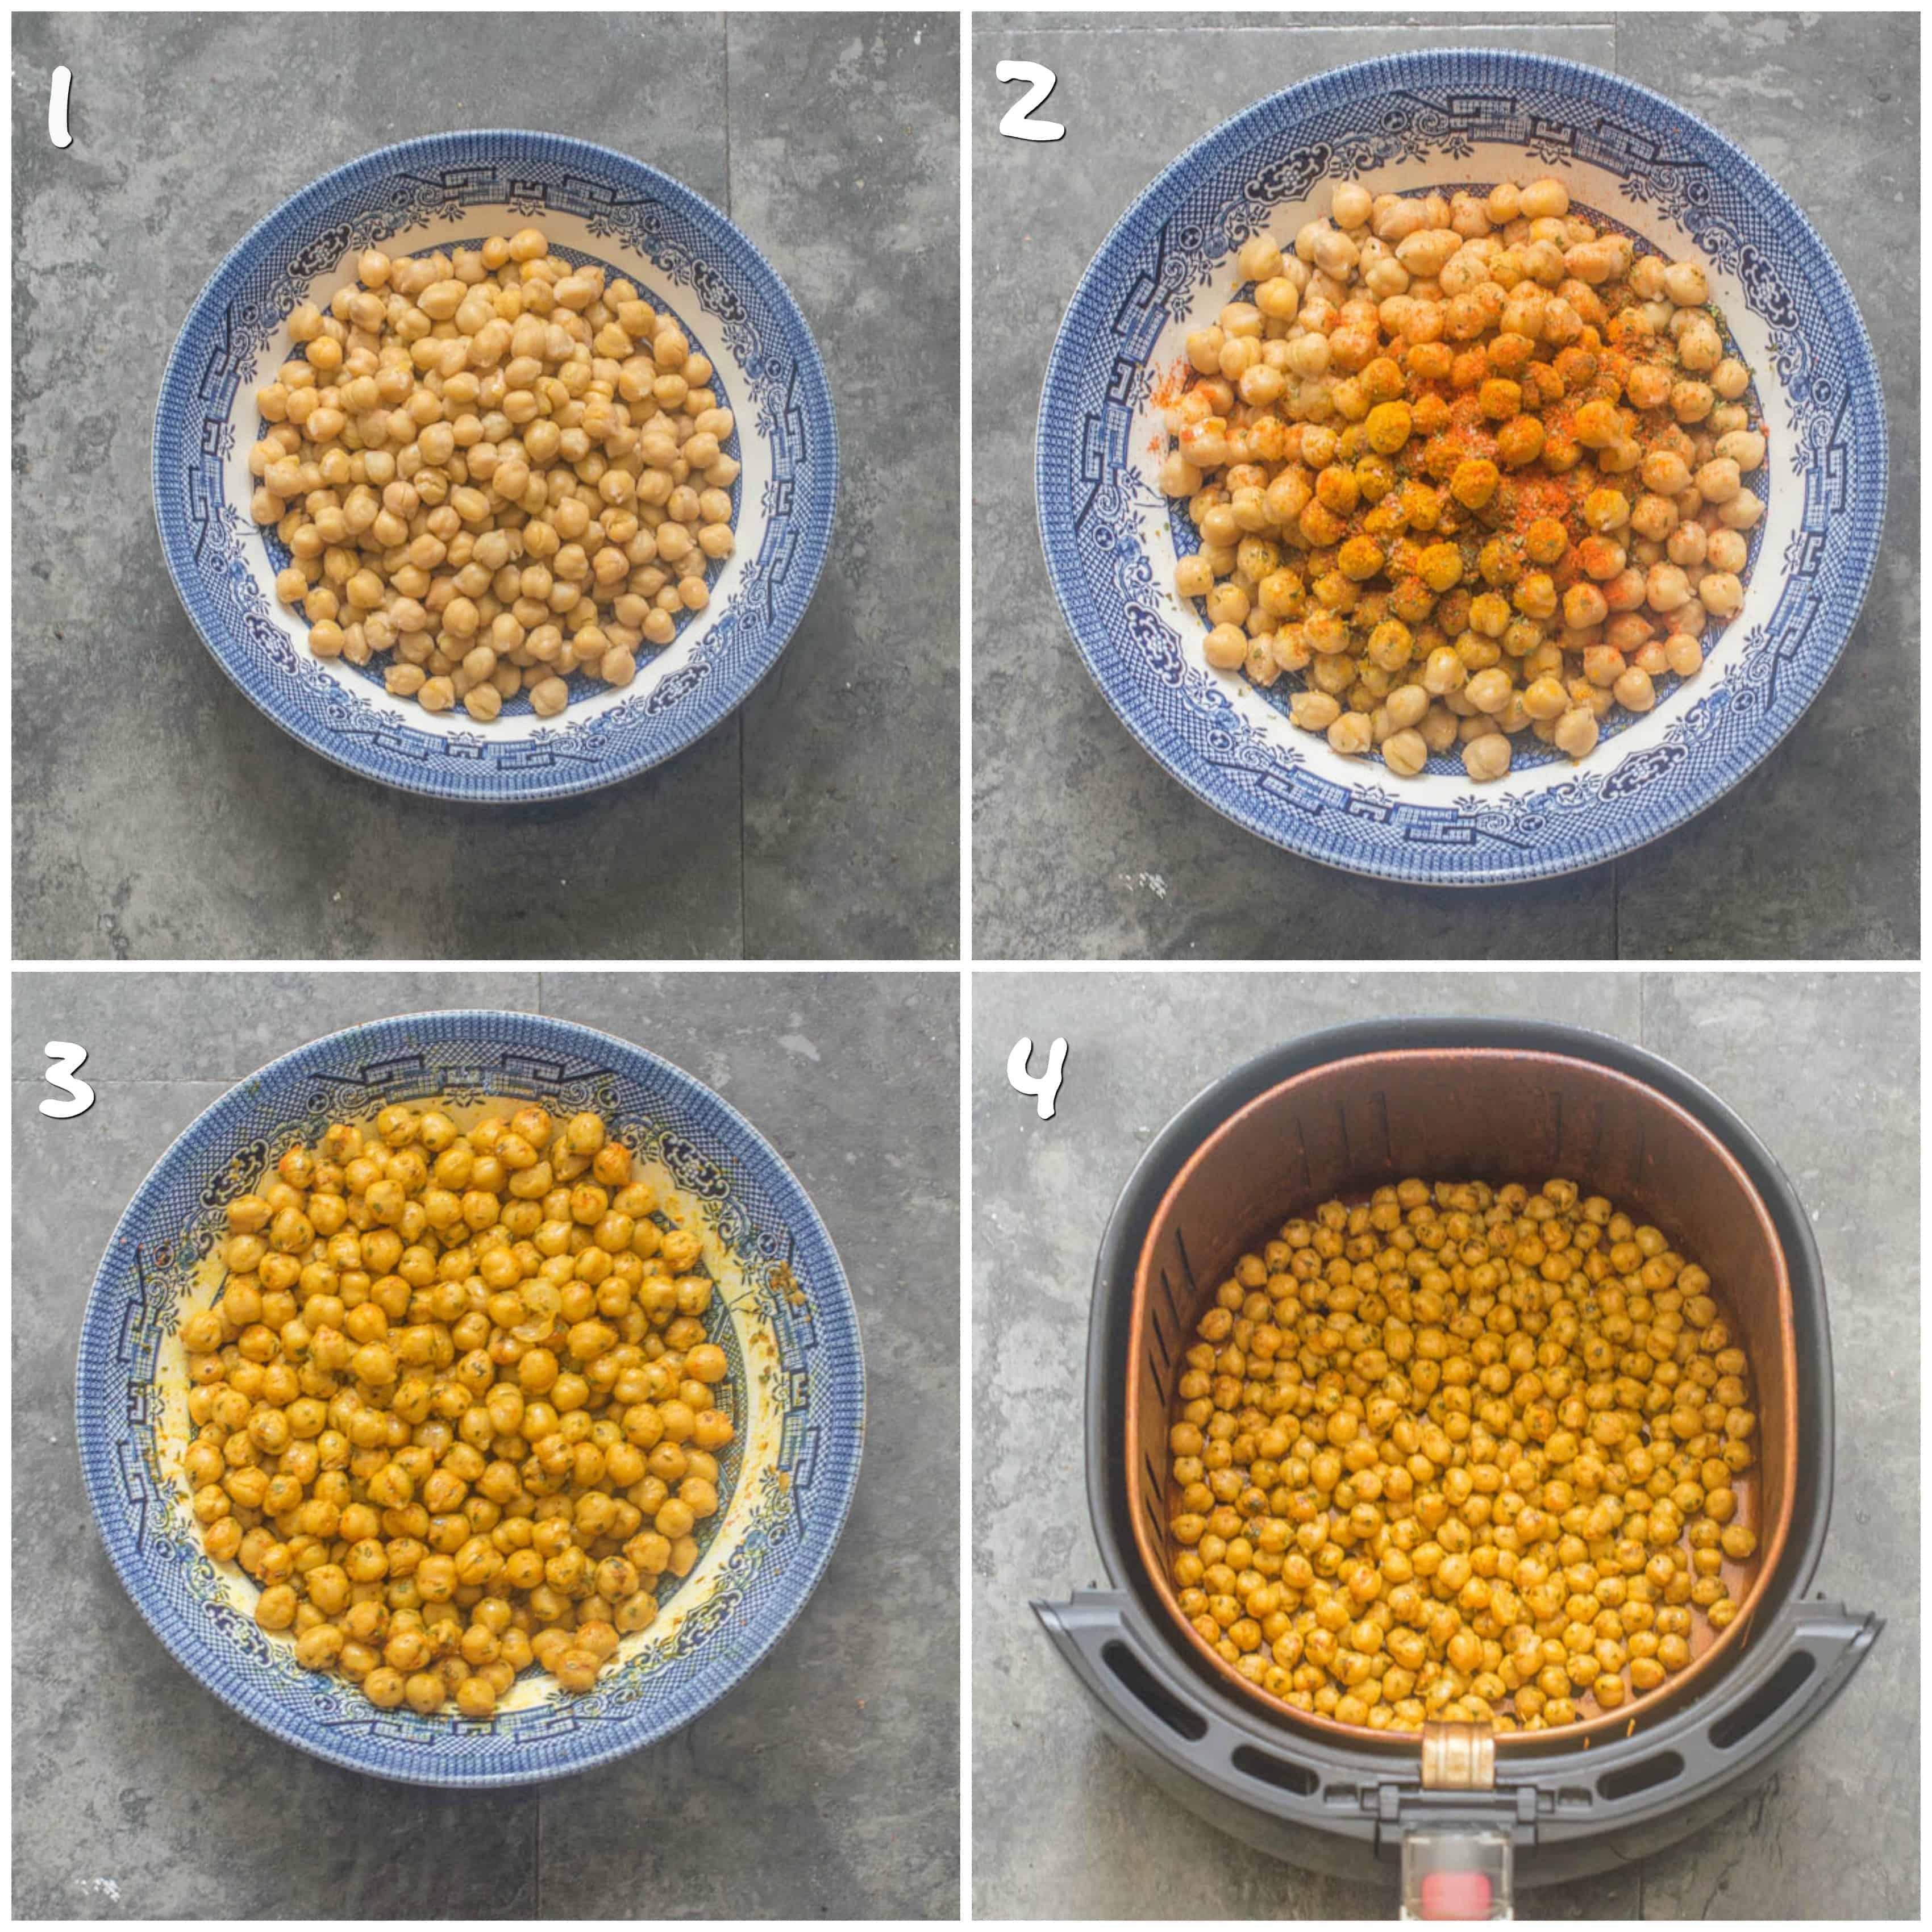 Curried air fryer chickpeas steps 1-4